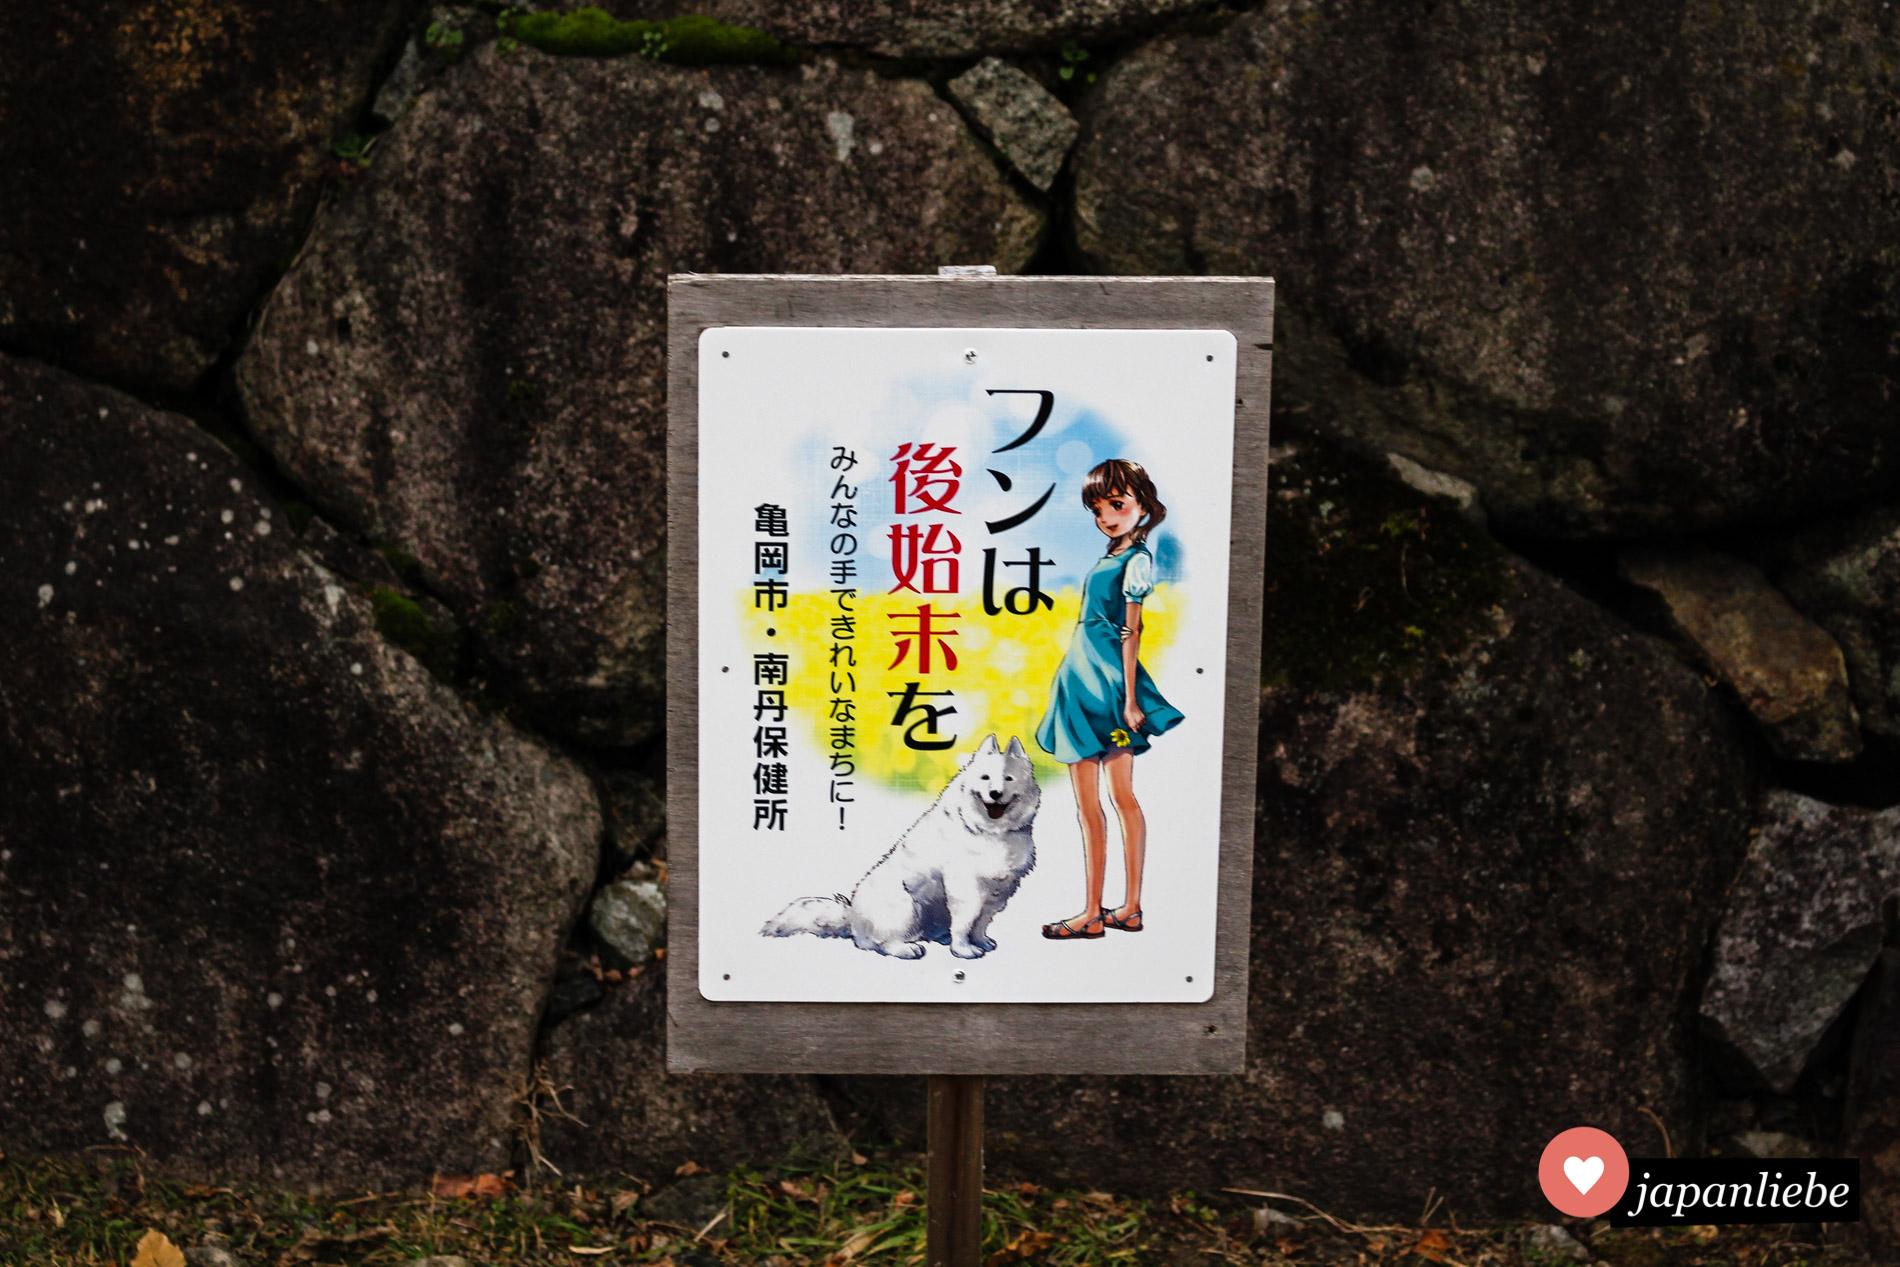 Ein eher nostalgisches Motiv in Arashiyama.